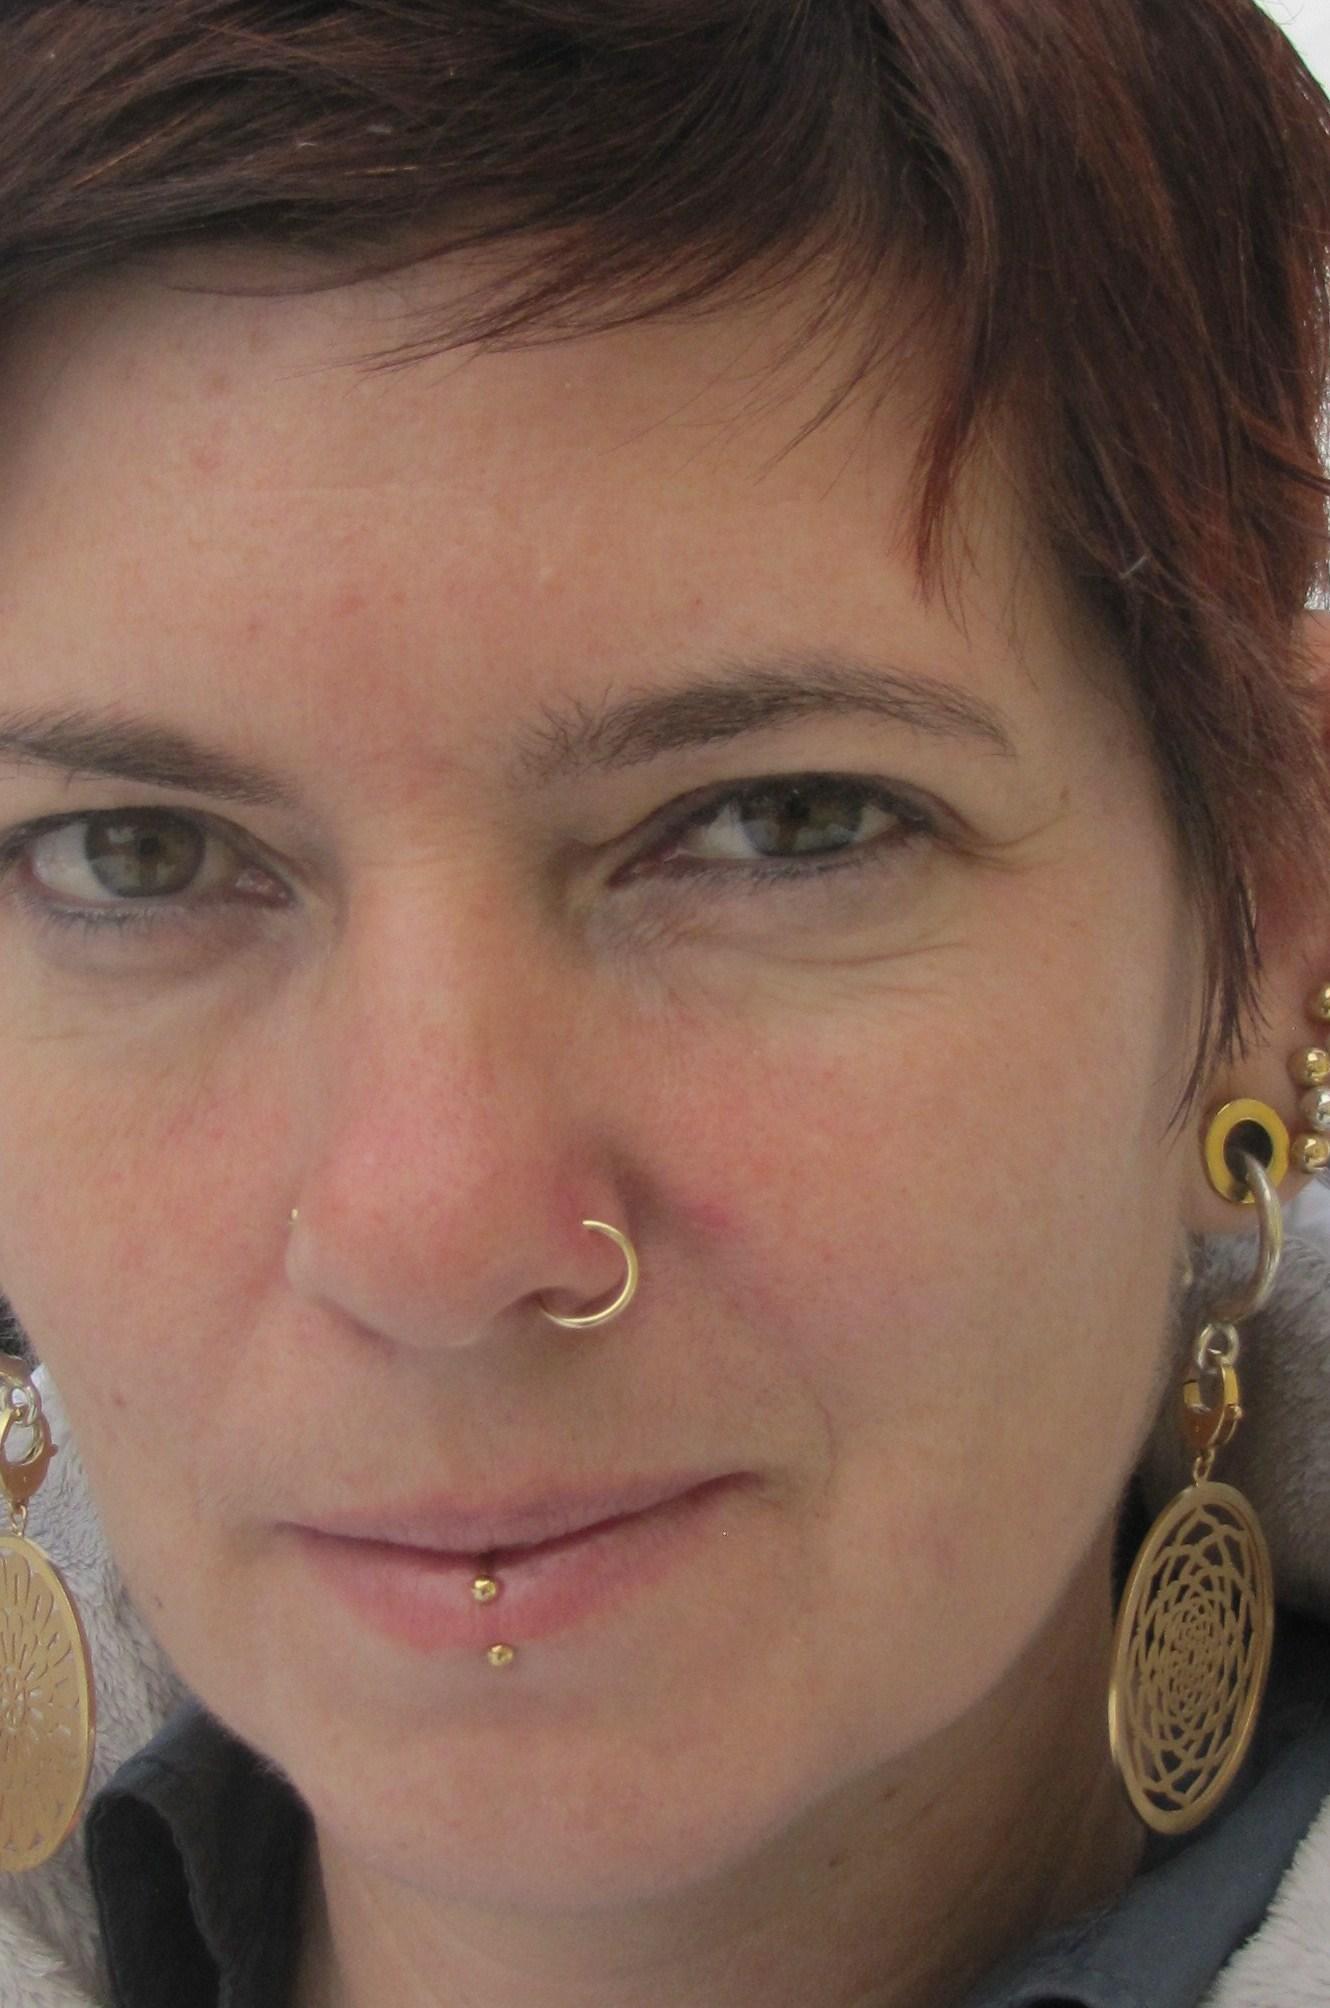 piercing retainer nase